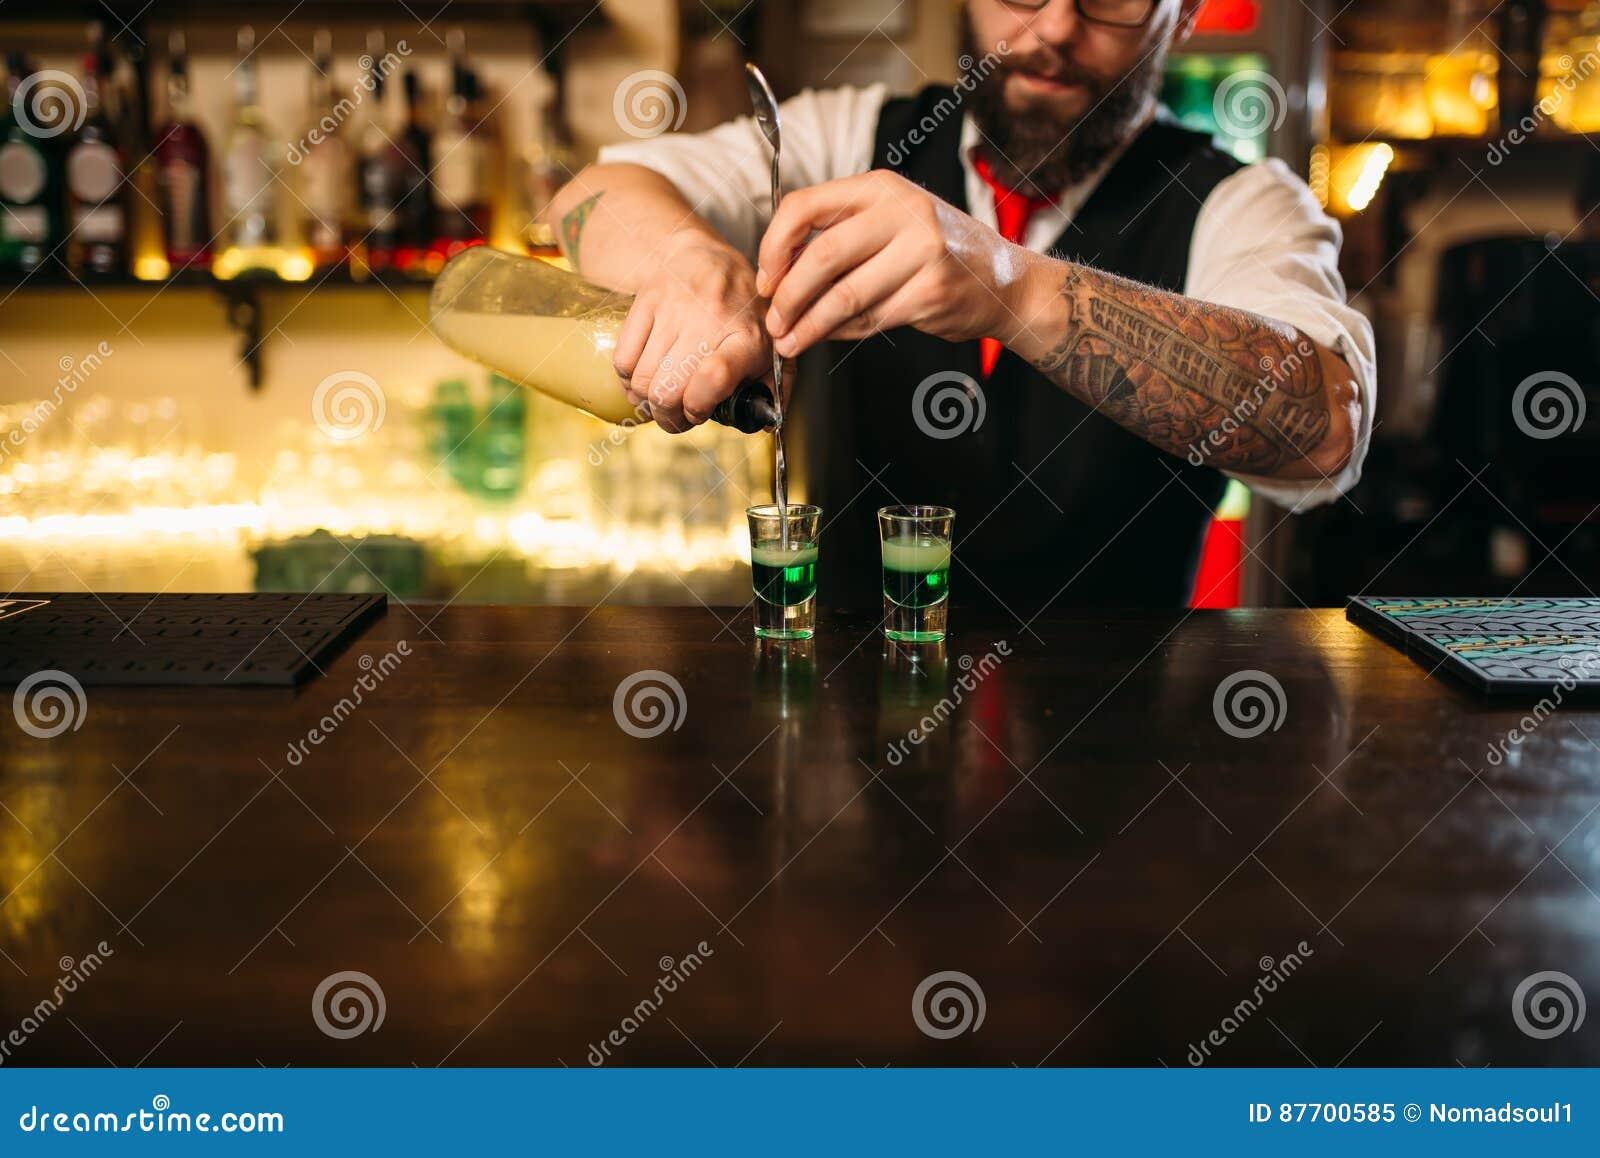 Barkeeper versant la boisson alcoolisée en verre